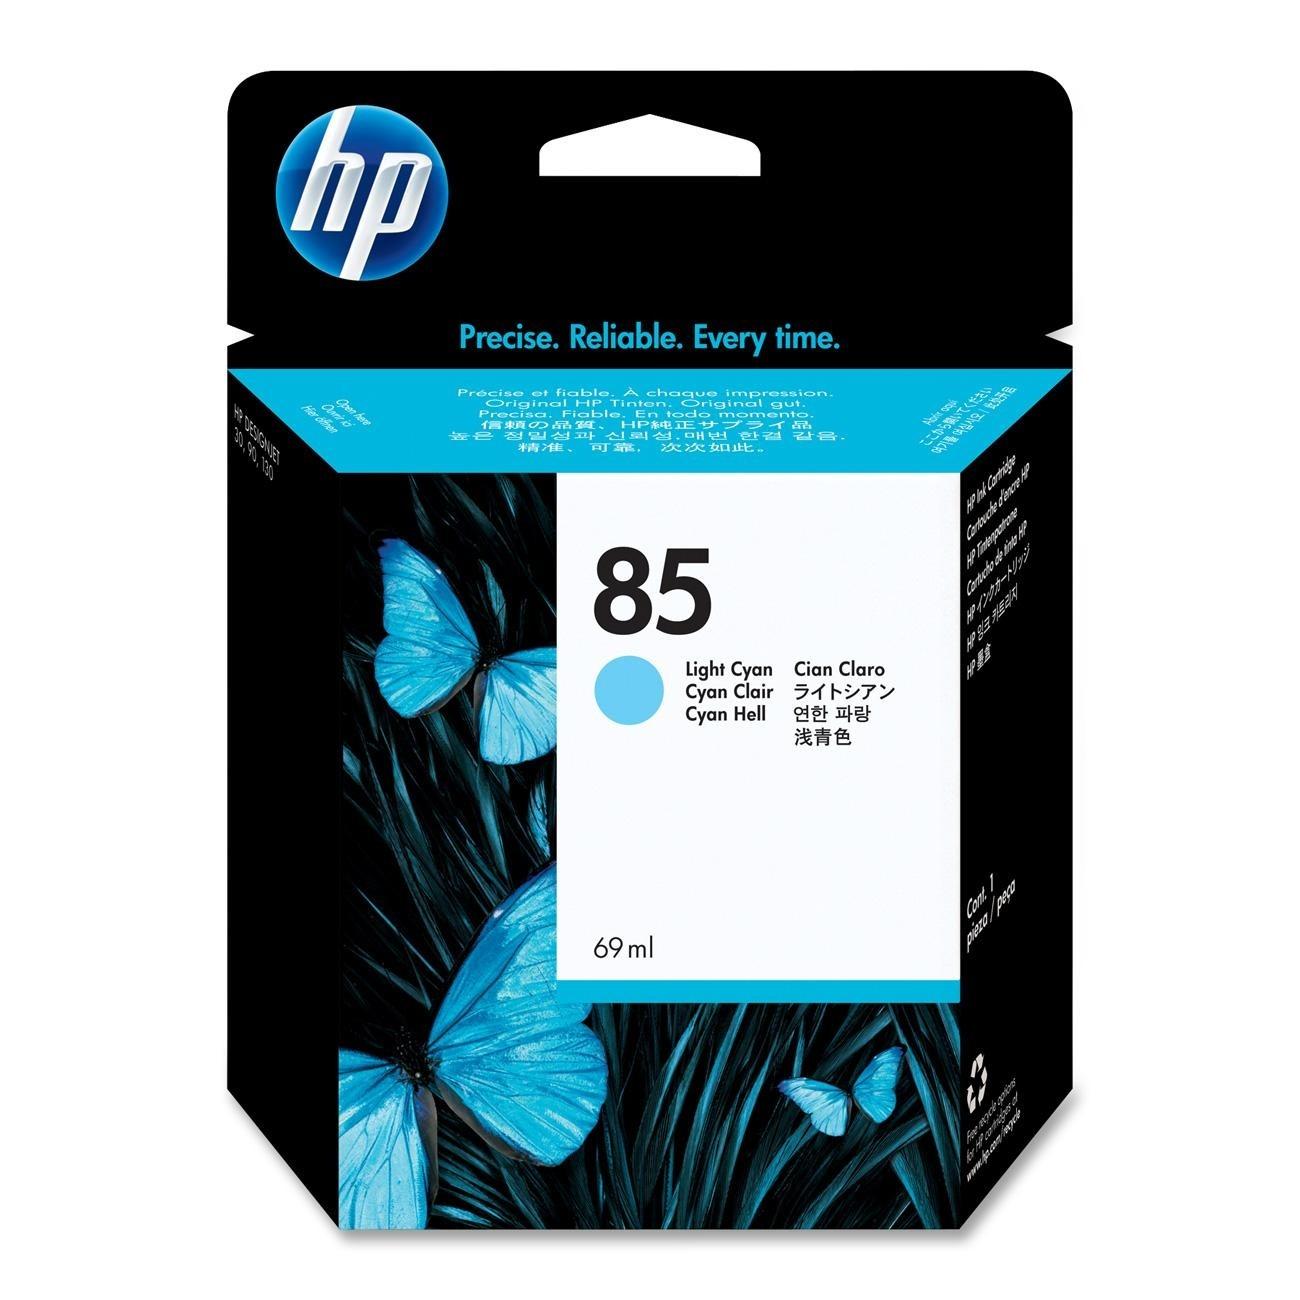 [HP] 정품플로터잉크 No.85 C9428A Light Cyan (DJ130/69ml)